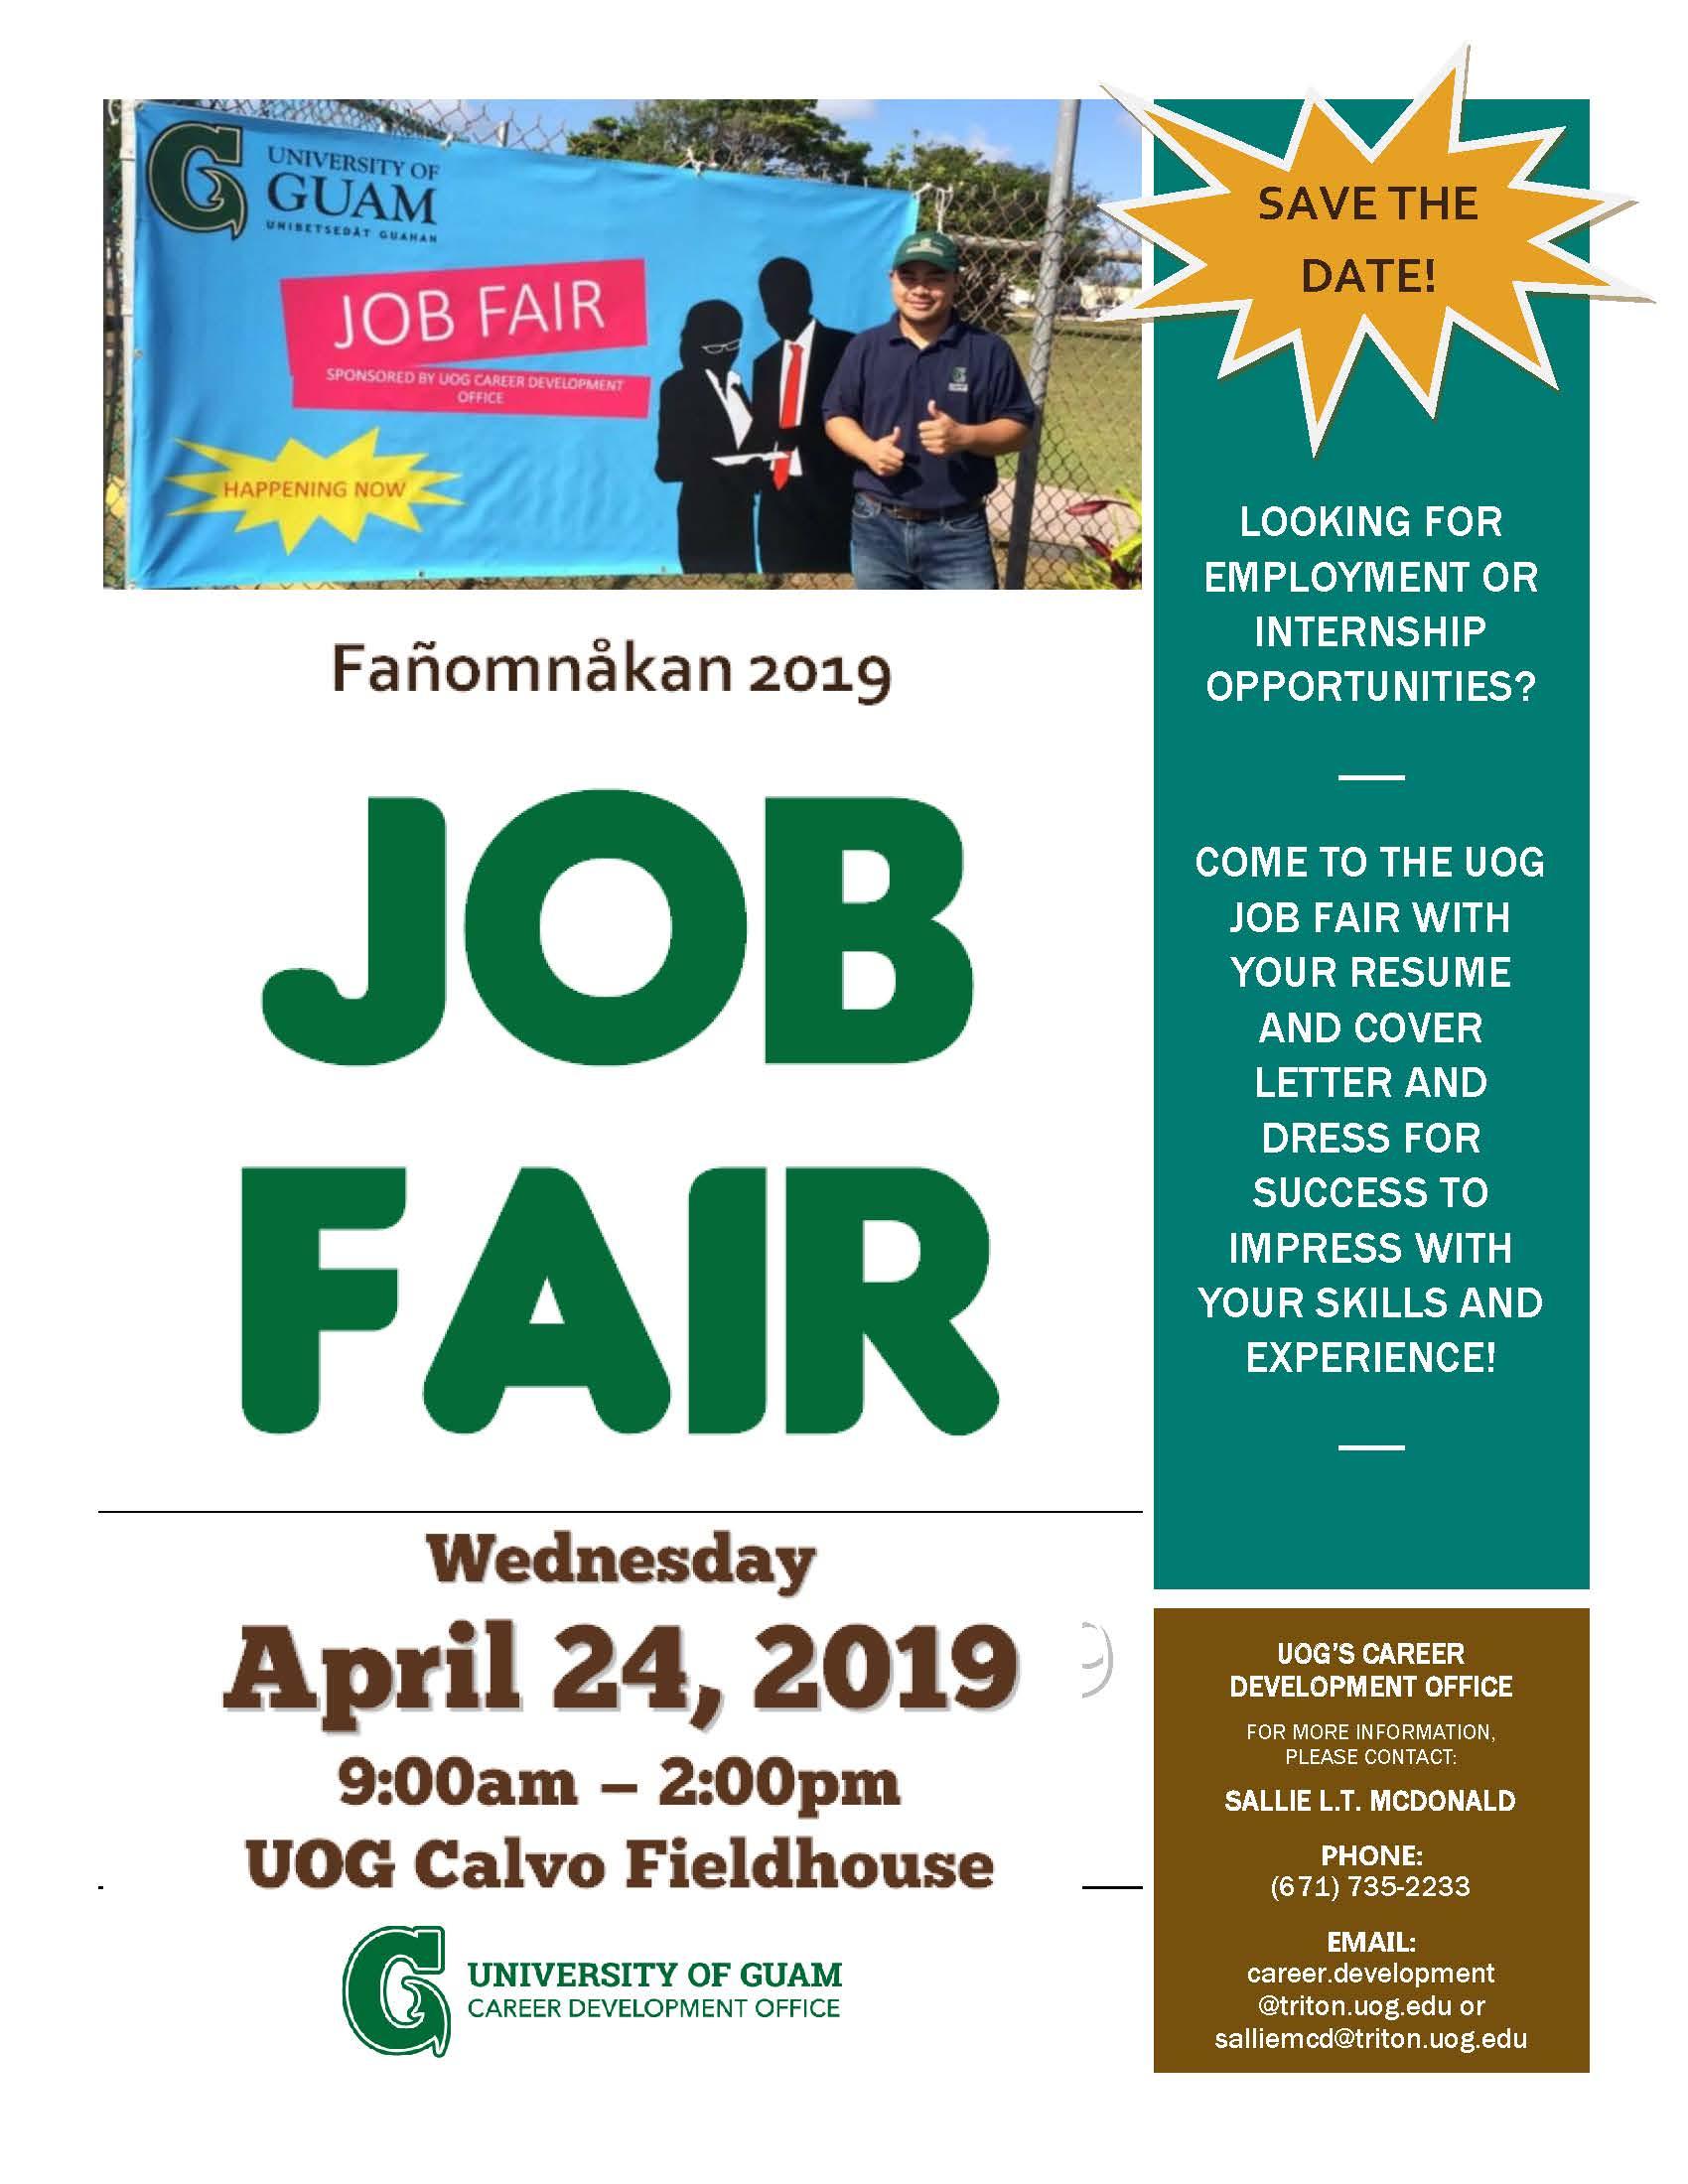 Career Development Office University Of Guam